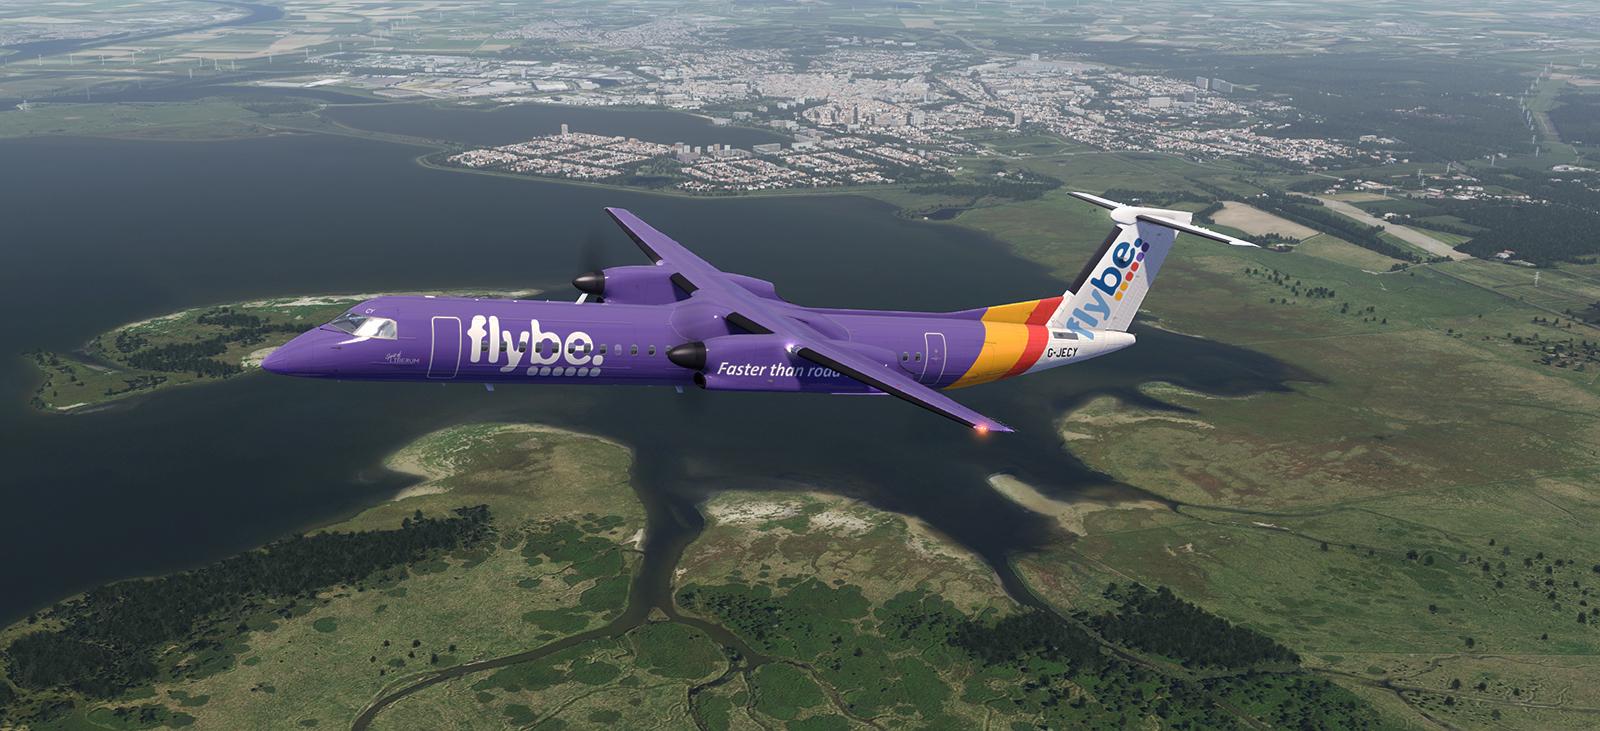 aerofly_fs_2_screenshot_22_20190317-2009